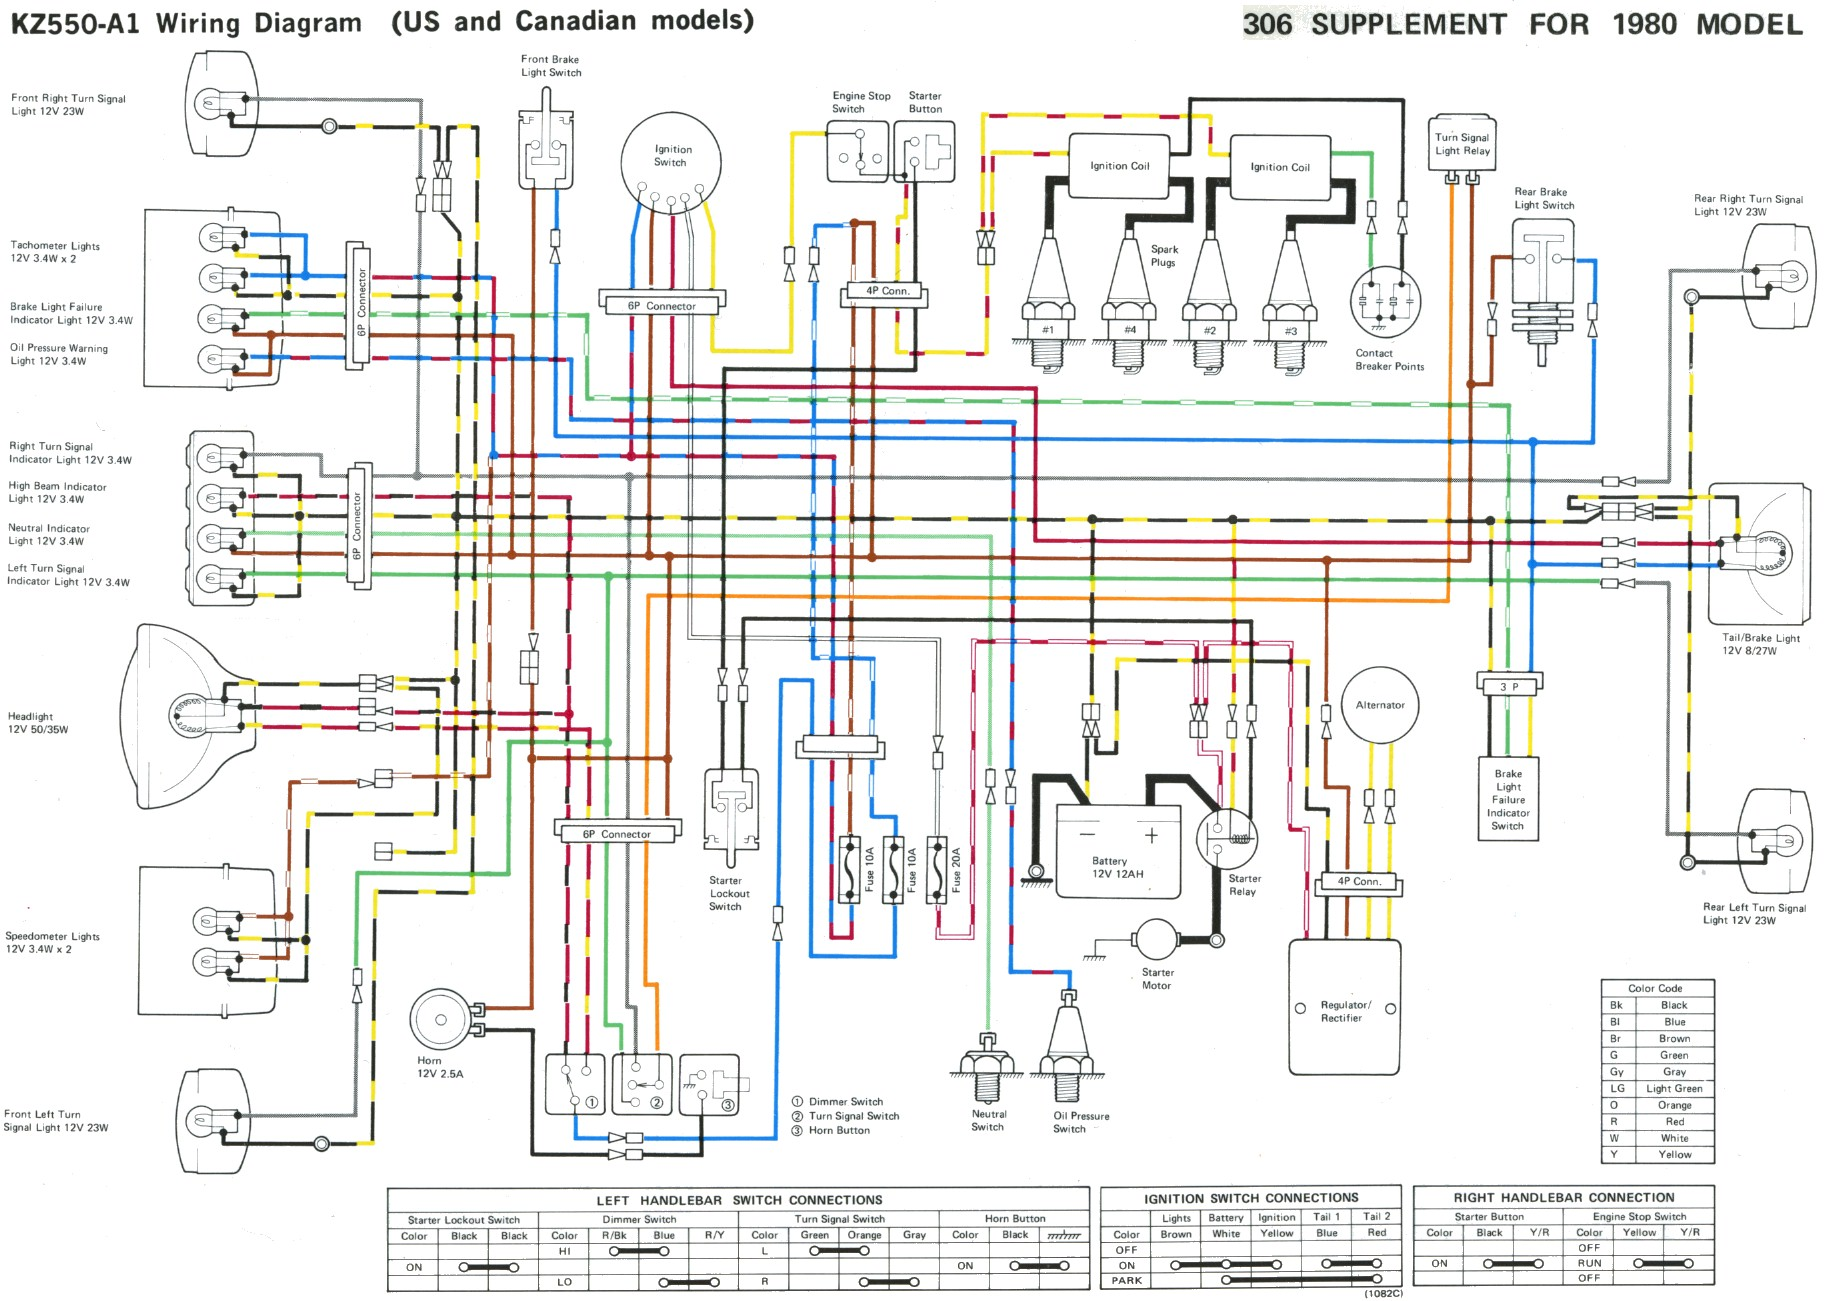 1979 kawasaki kz1000 wiring diagram 97 ford explorer audio some kz 400 500 550 wire diagrams